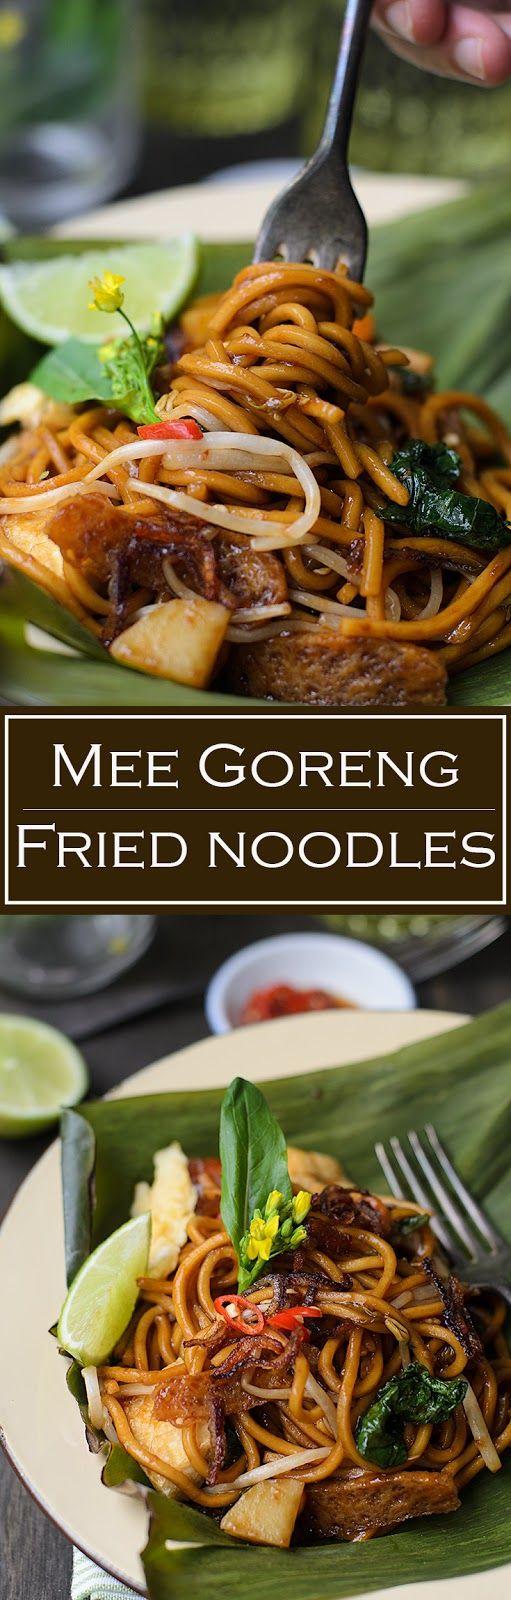 218 best lisas lemony kitchen on malaysian food images on malaysian mee goreng recipe mee goreng fried noodles is one of many malaysians forumfinder Choice Image